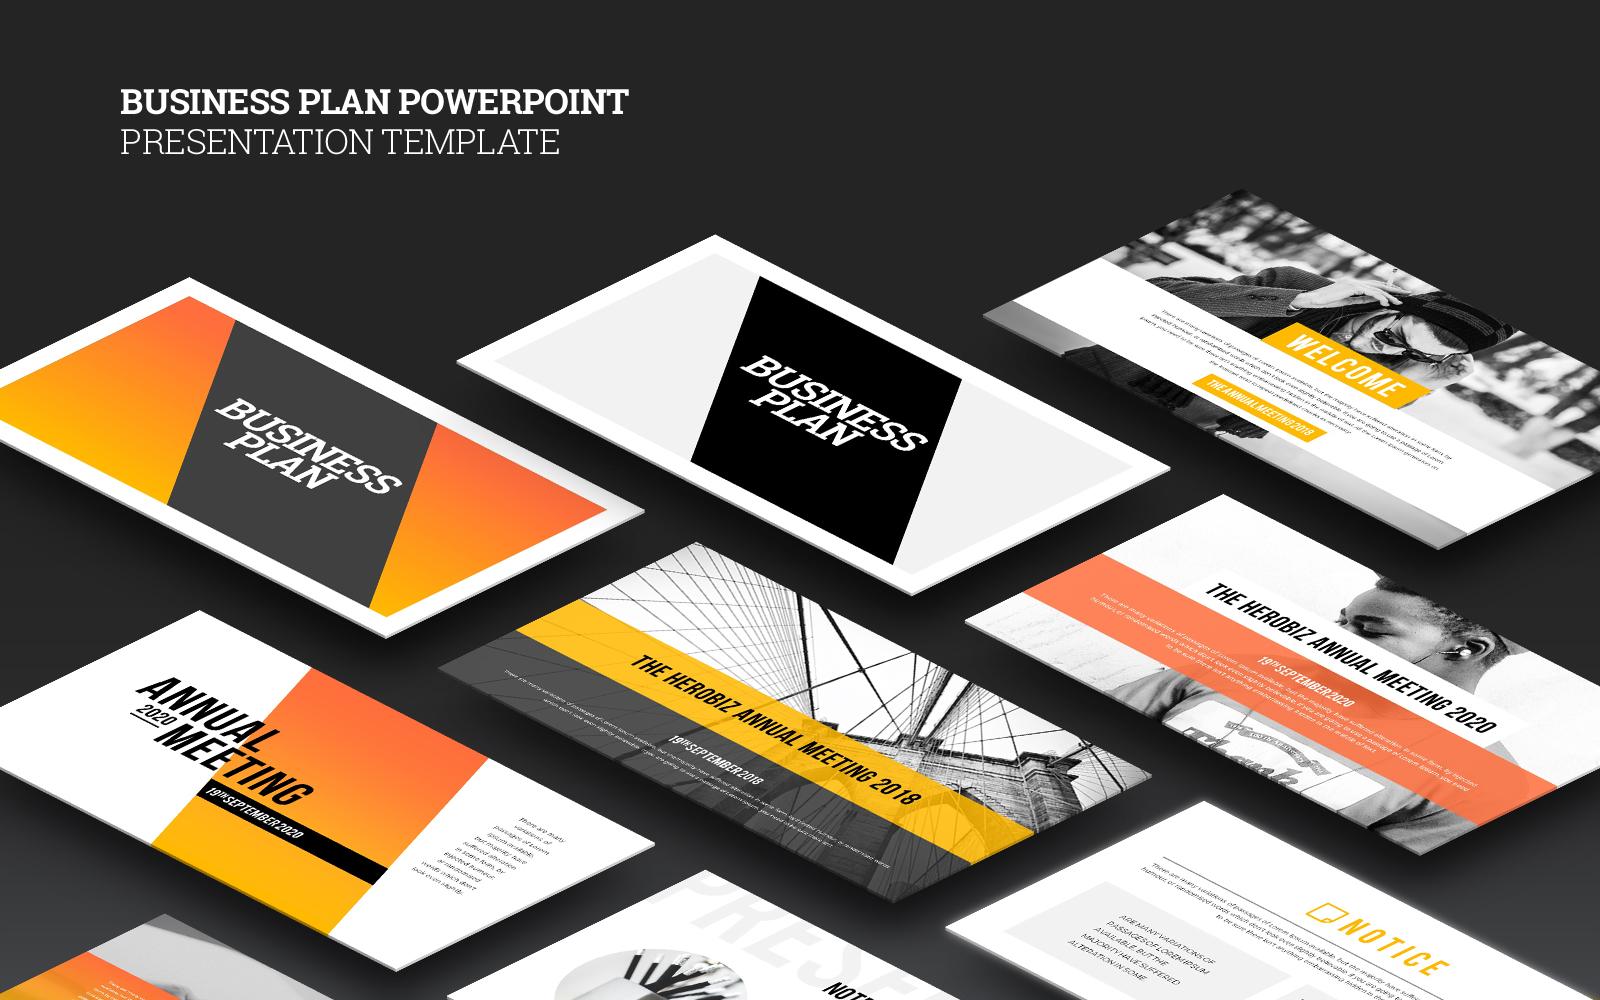 Business Plan Presentation Template PowerPoint №126362